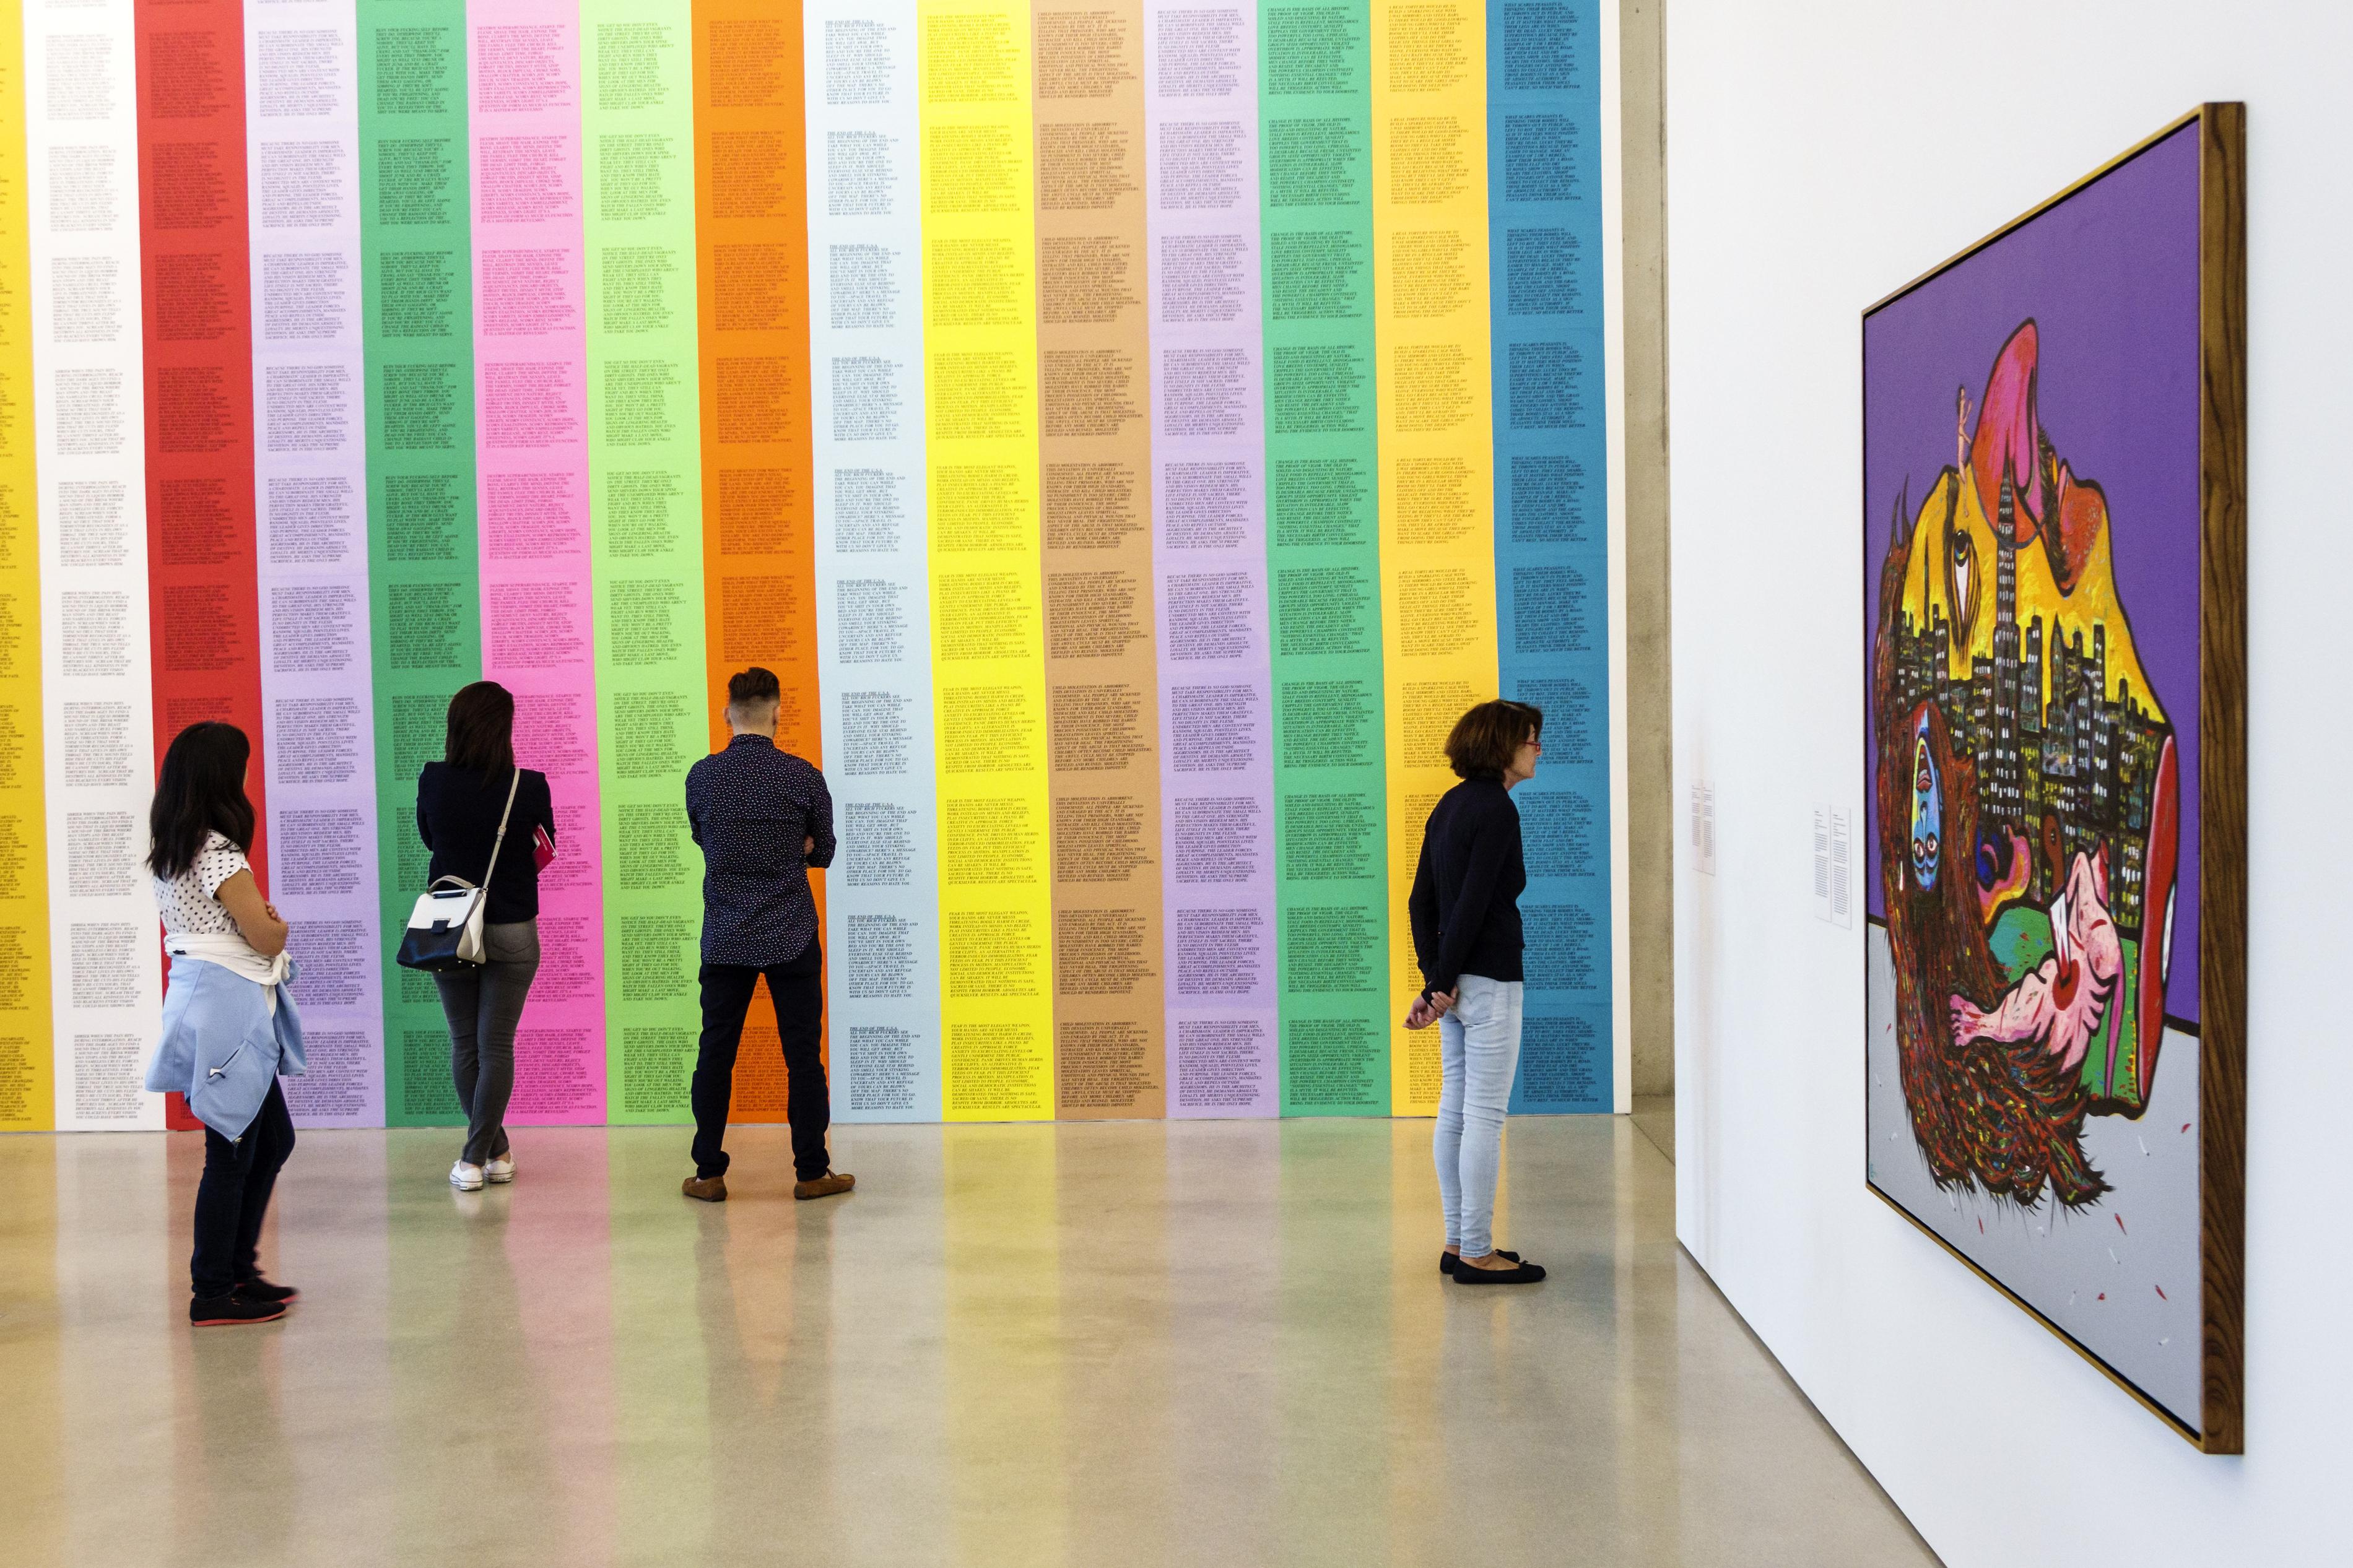 Inflammatory Essays inside the Perez Art Museum Miami